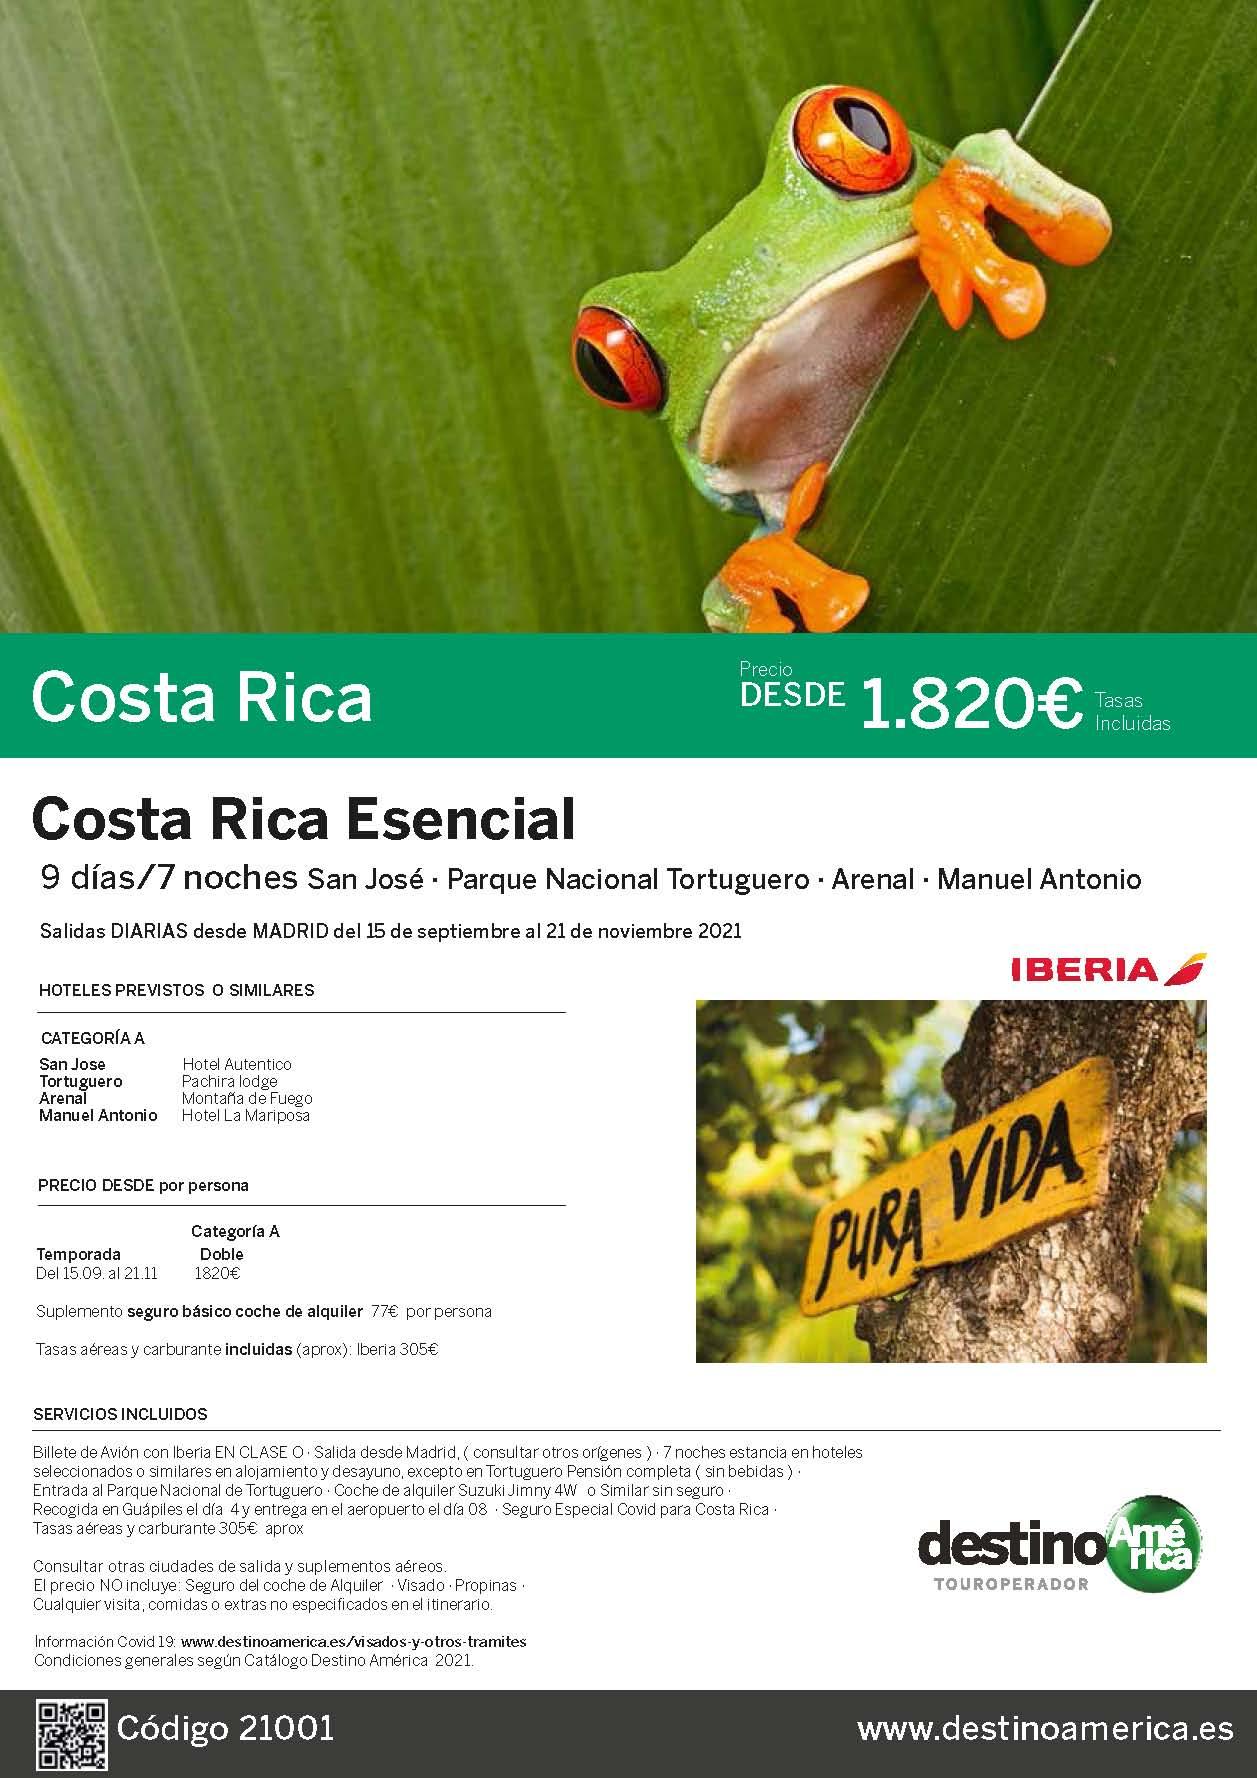 Oferta Destino America Costa Rica Esencial Octubre a Noviembre 2021 vuelo directo desde Madrid